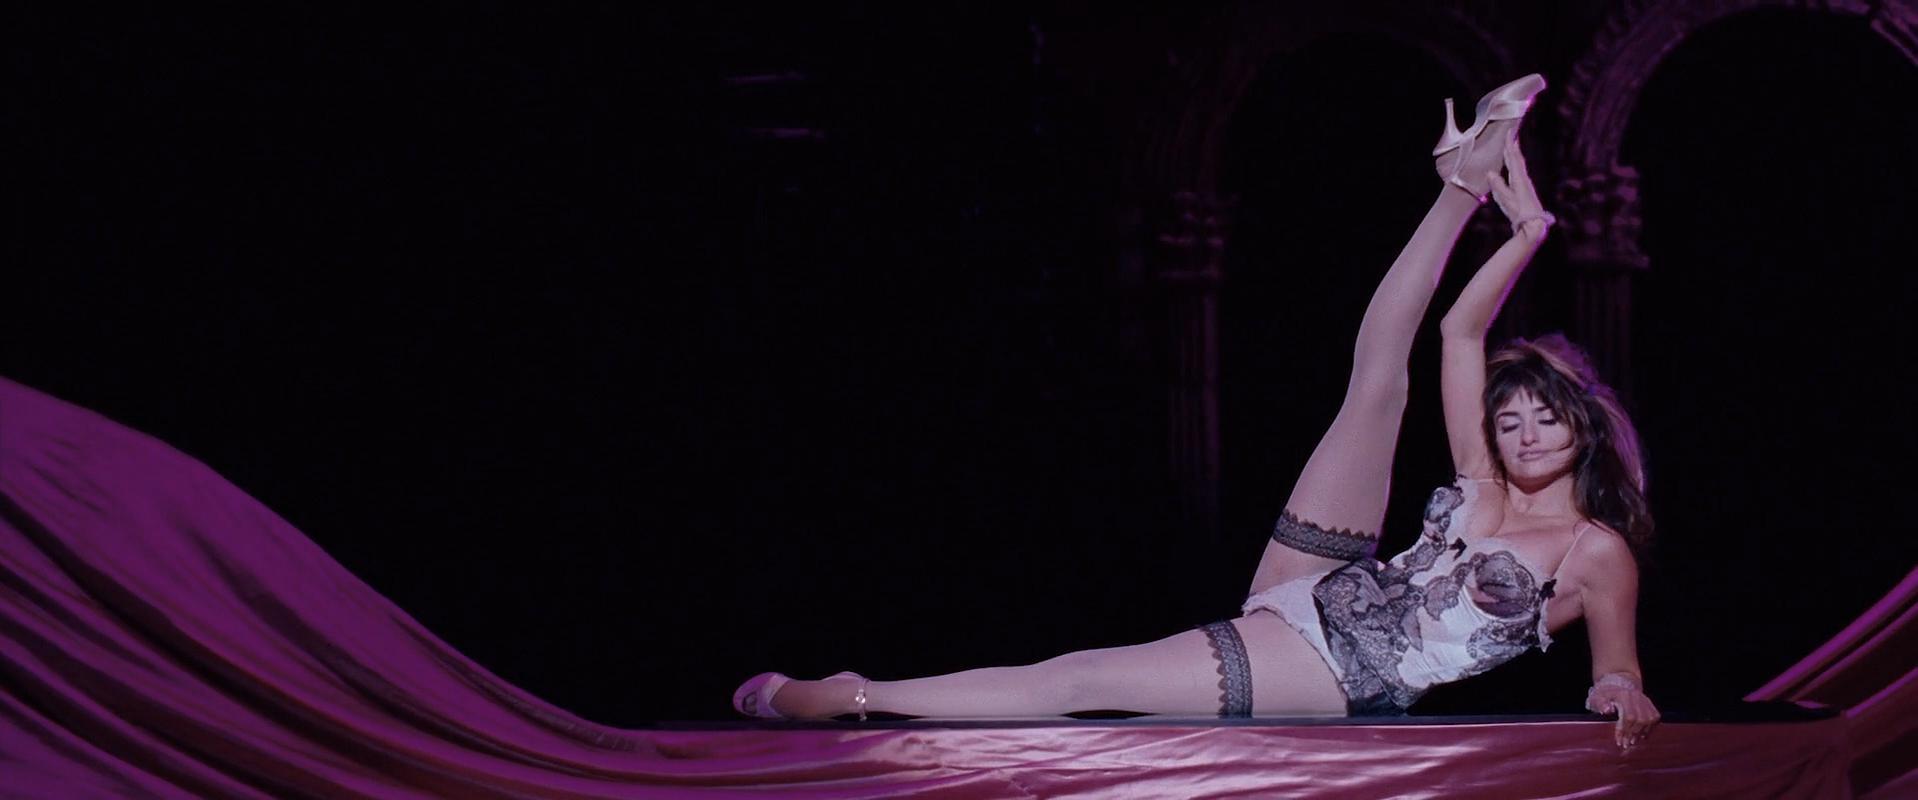 Penelope Cruz sexy, Marion Cotillard sexy, Fergie sexy - Nine (2009)